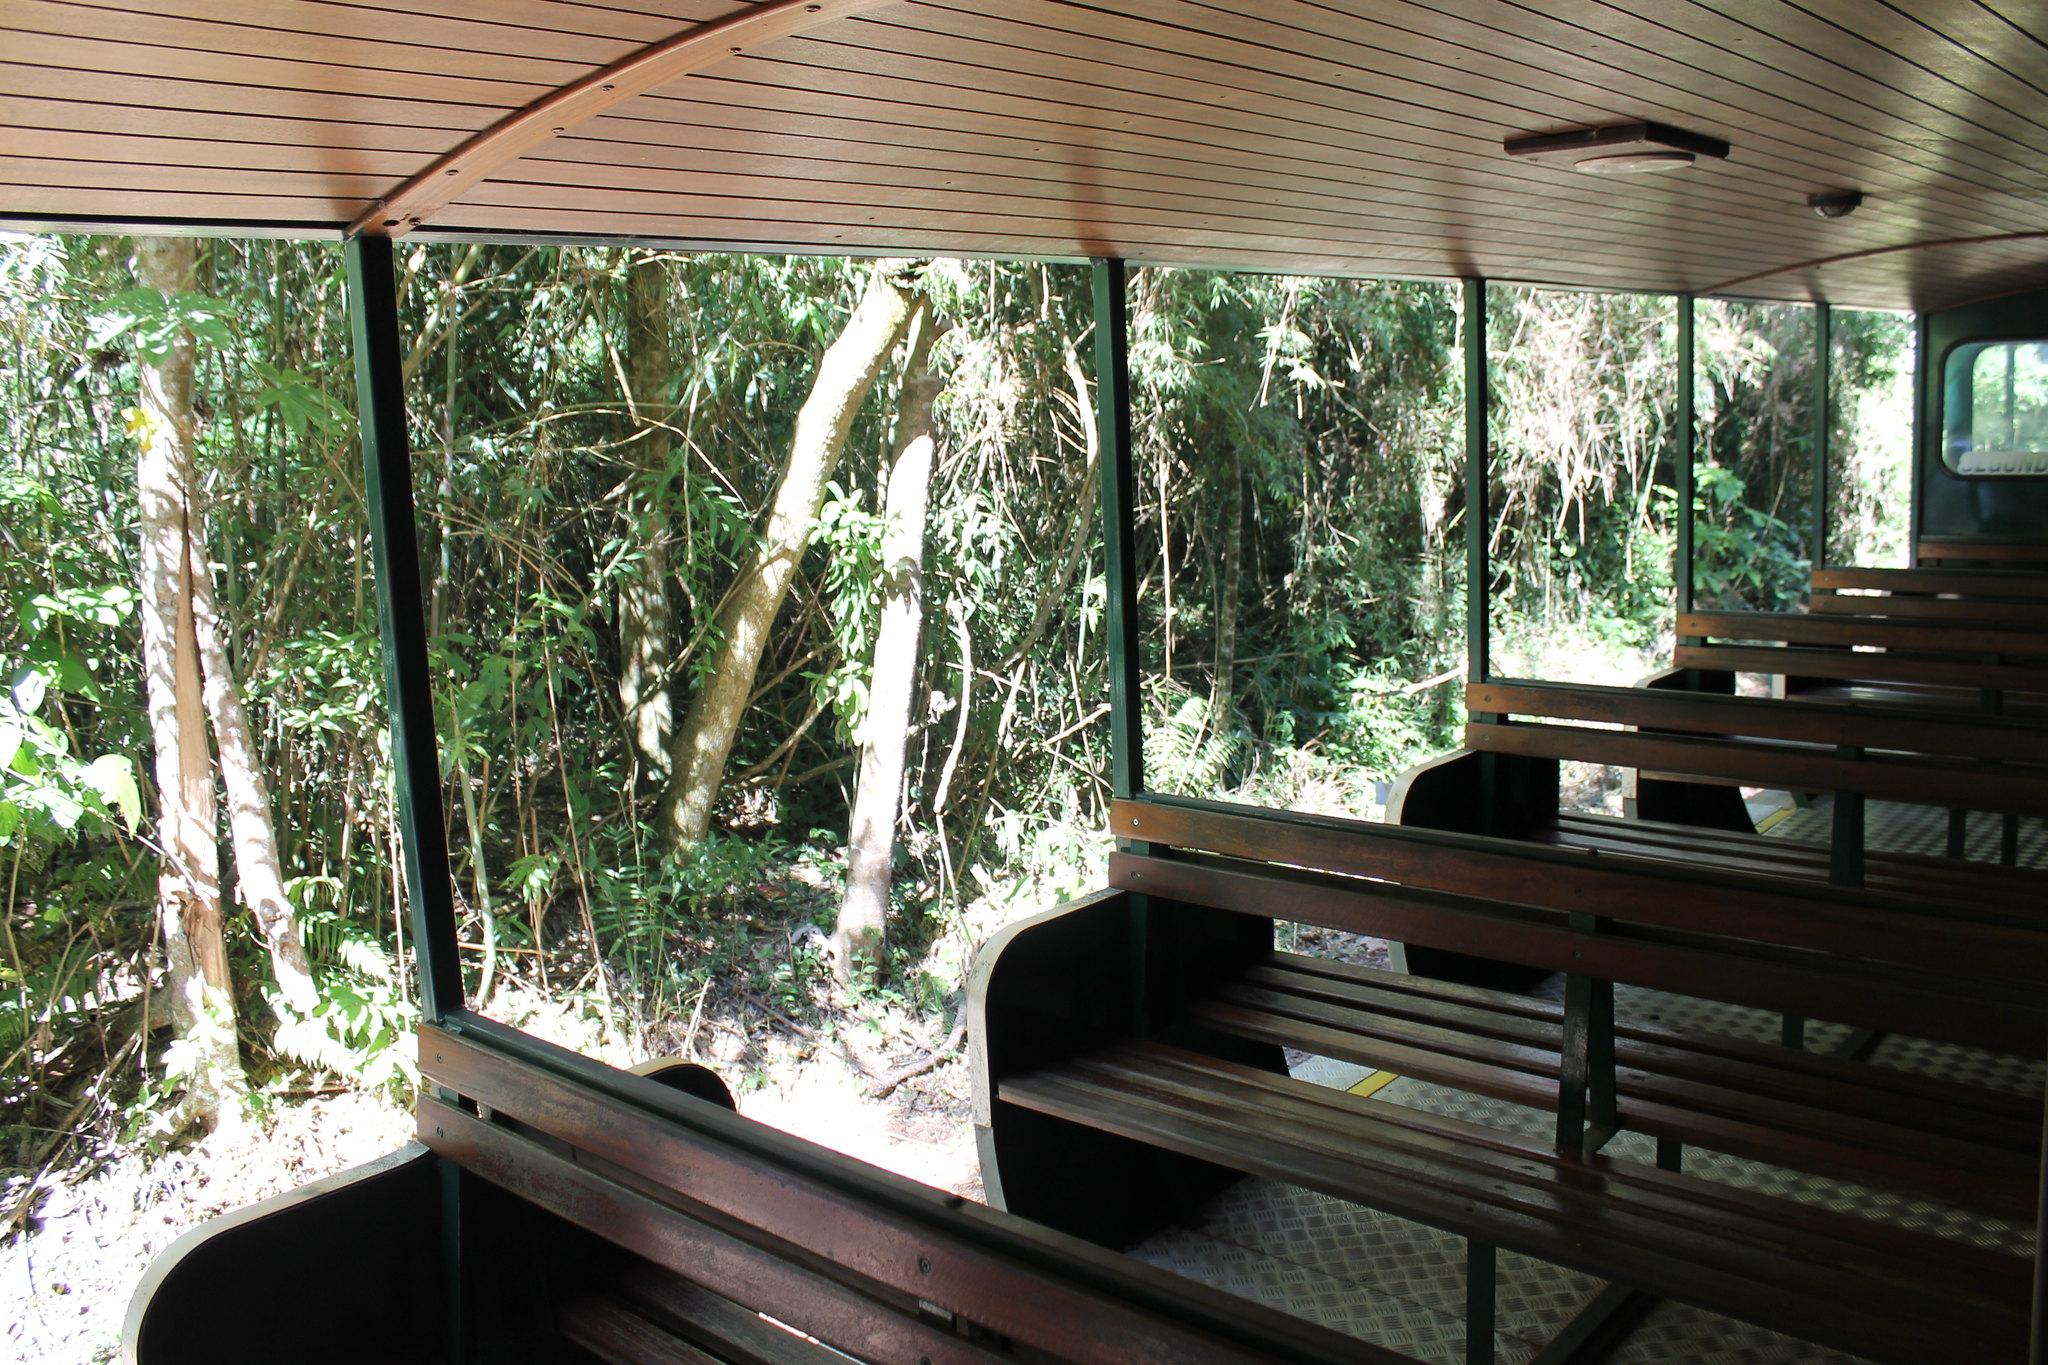 cataratas-iguazu-trem